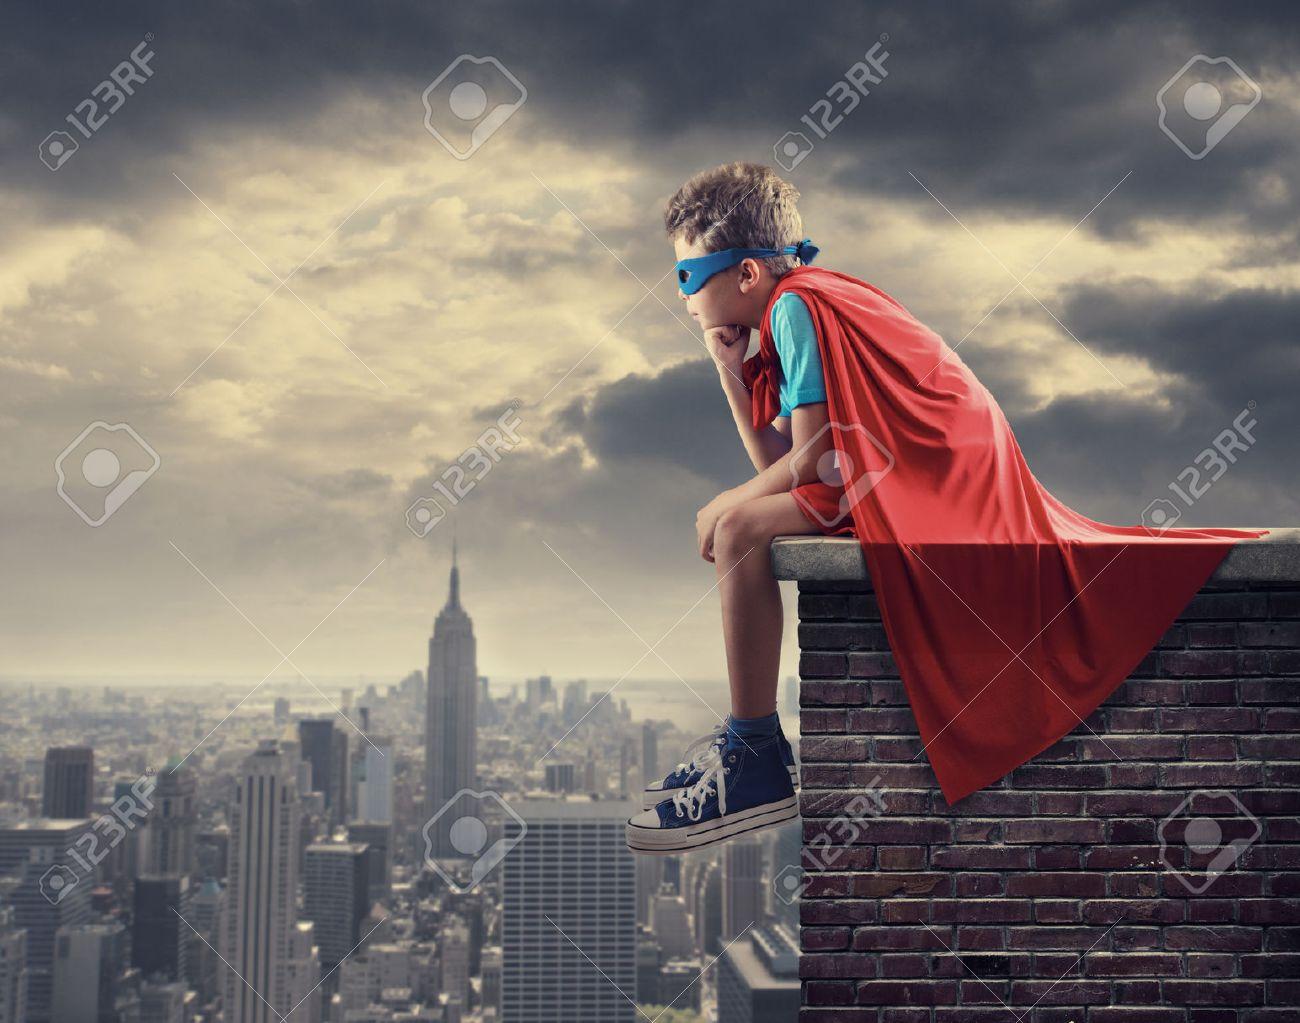 A young boy dreams of becoming a superhero. - 22427996